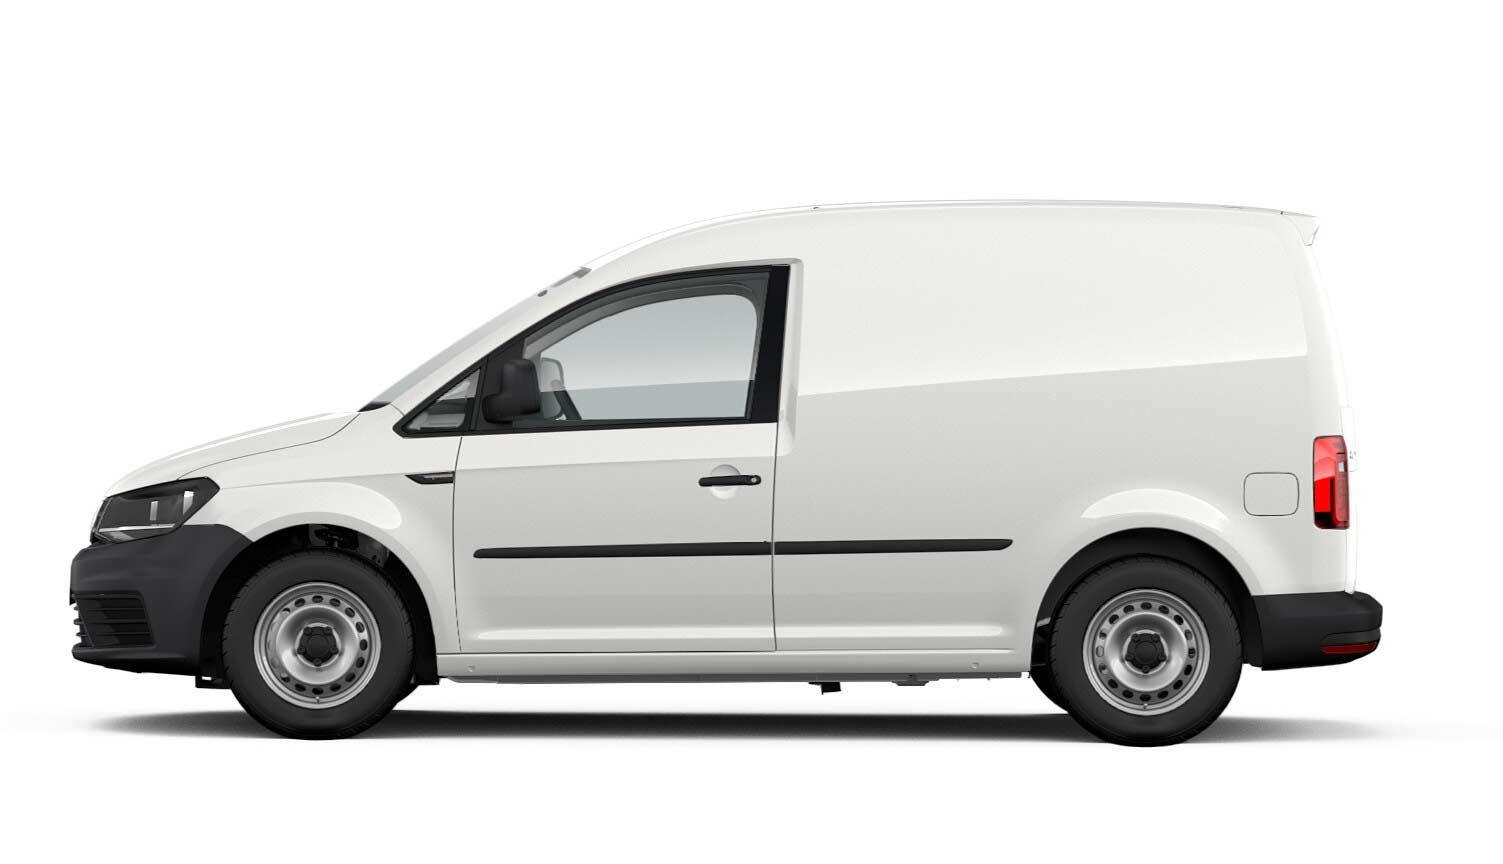 "Caddy Kastenwagen Maxi ""EcoProfi"" Motor: 1,0 l TSI EU6 BlueMotion Technology 75 kW Getriebe: 5-Gang-Schaltgetriebe Radstand: 2681 mm"